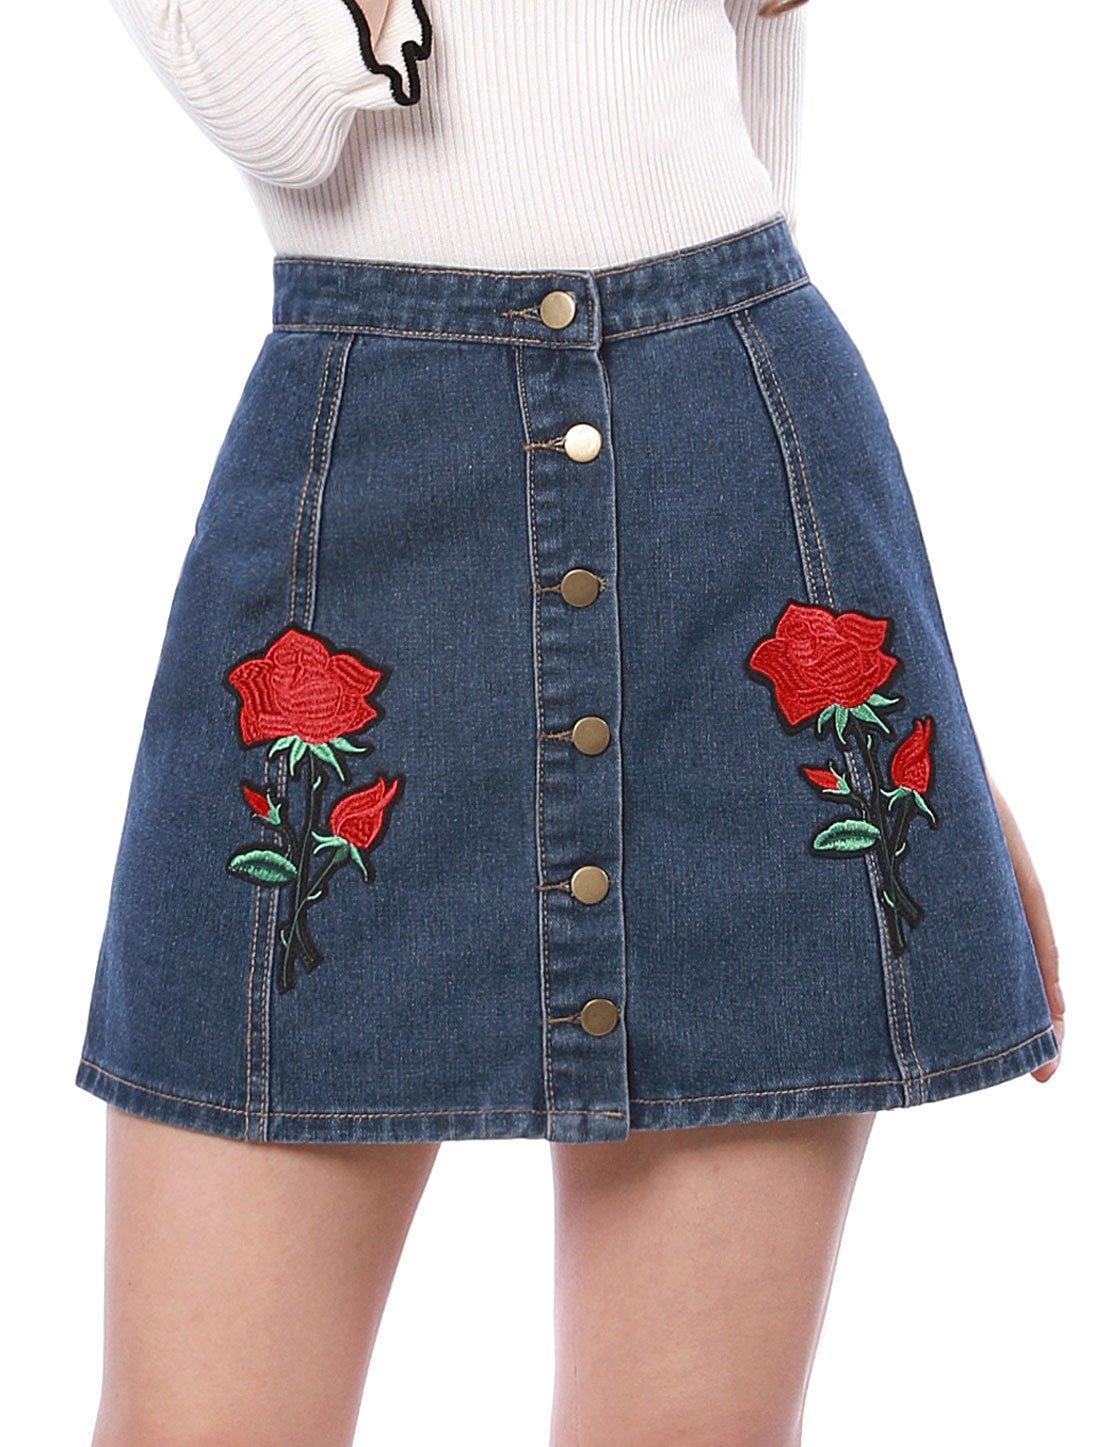 Allegra K Women's Rose Floral Applique Button Front A-Line Denim Skirt XL Blue